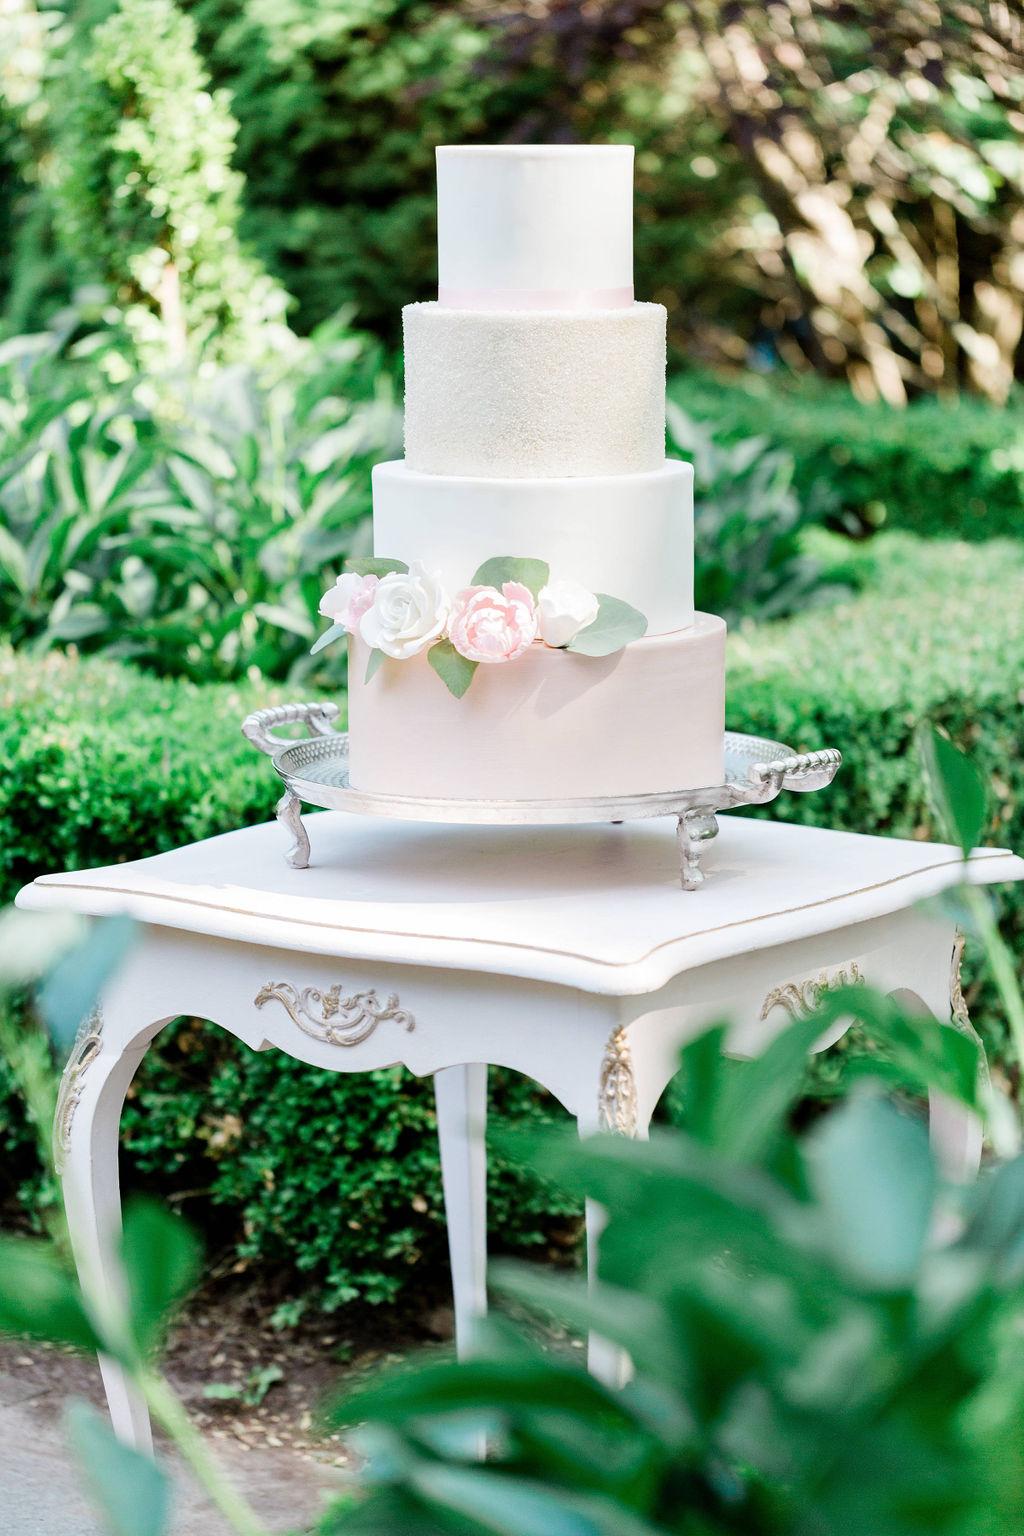 Kurtz-Orchards-Niagara-on-the-Lake-Styled-Wedding-Session-Shotlife-Studio-Calderone-Co-Luxury-Events-Vineyard-Bride-32.JPG